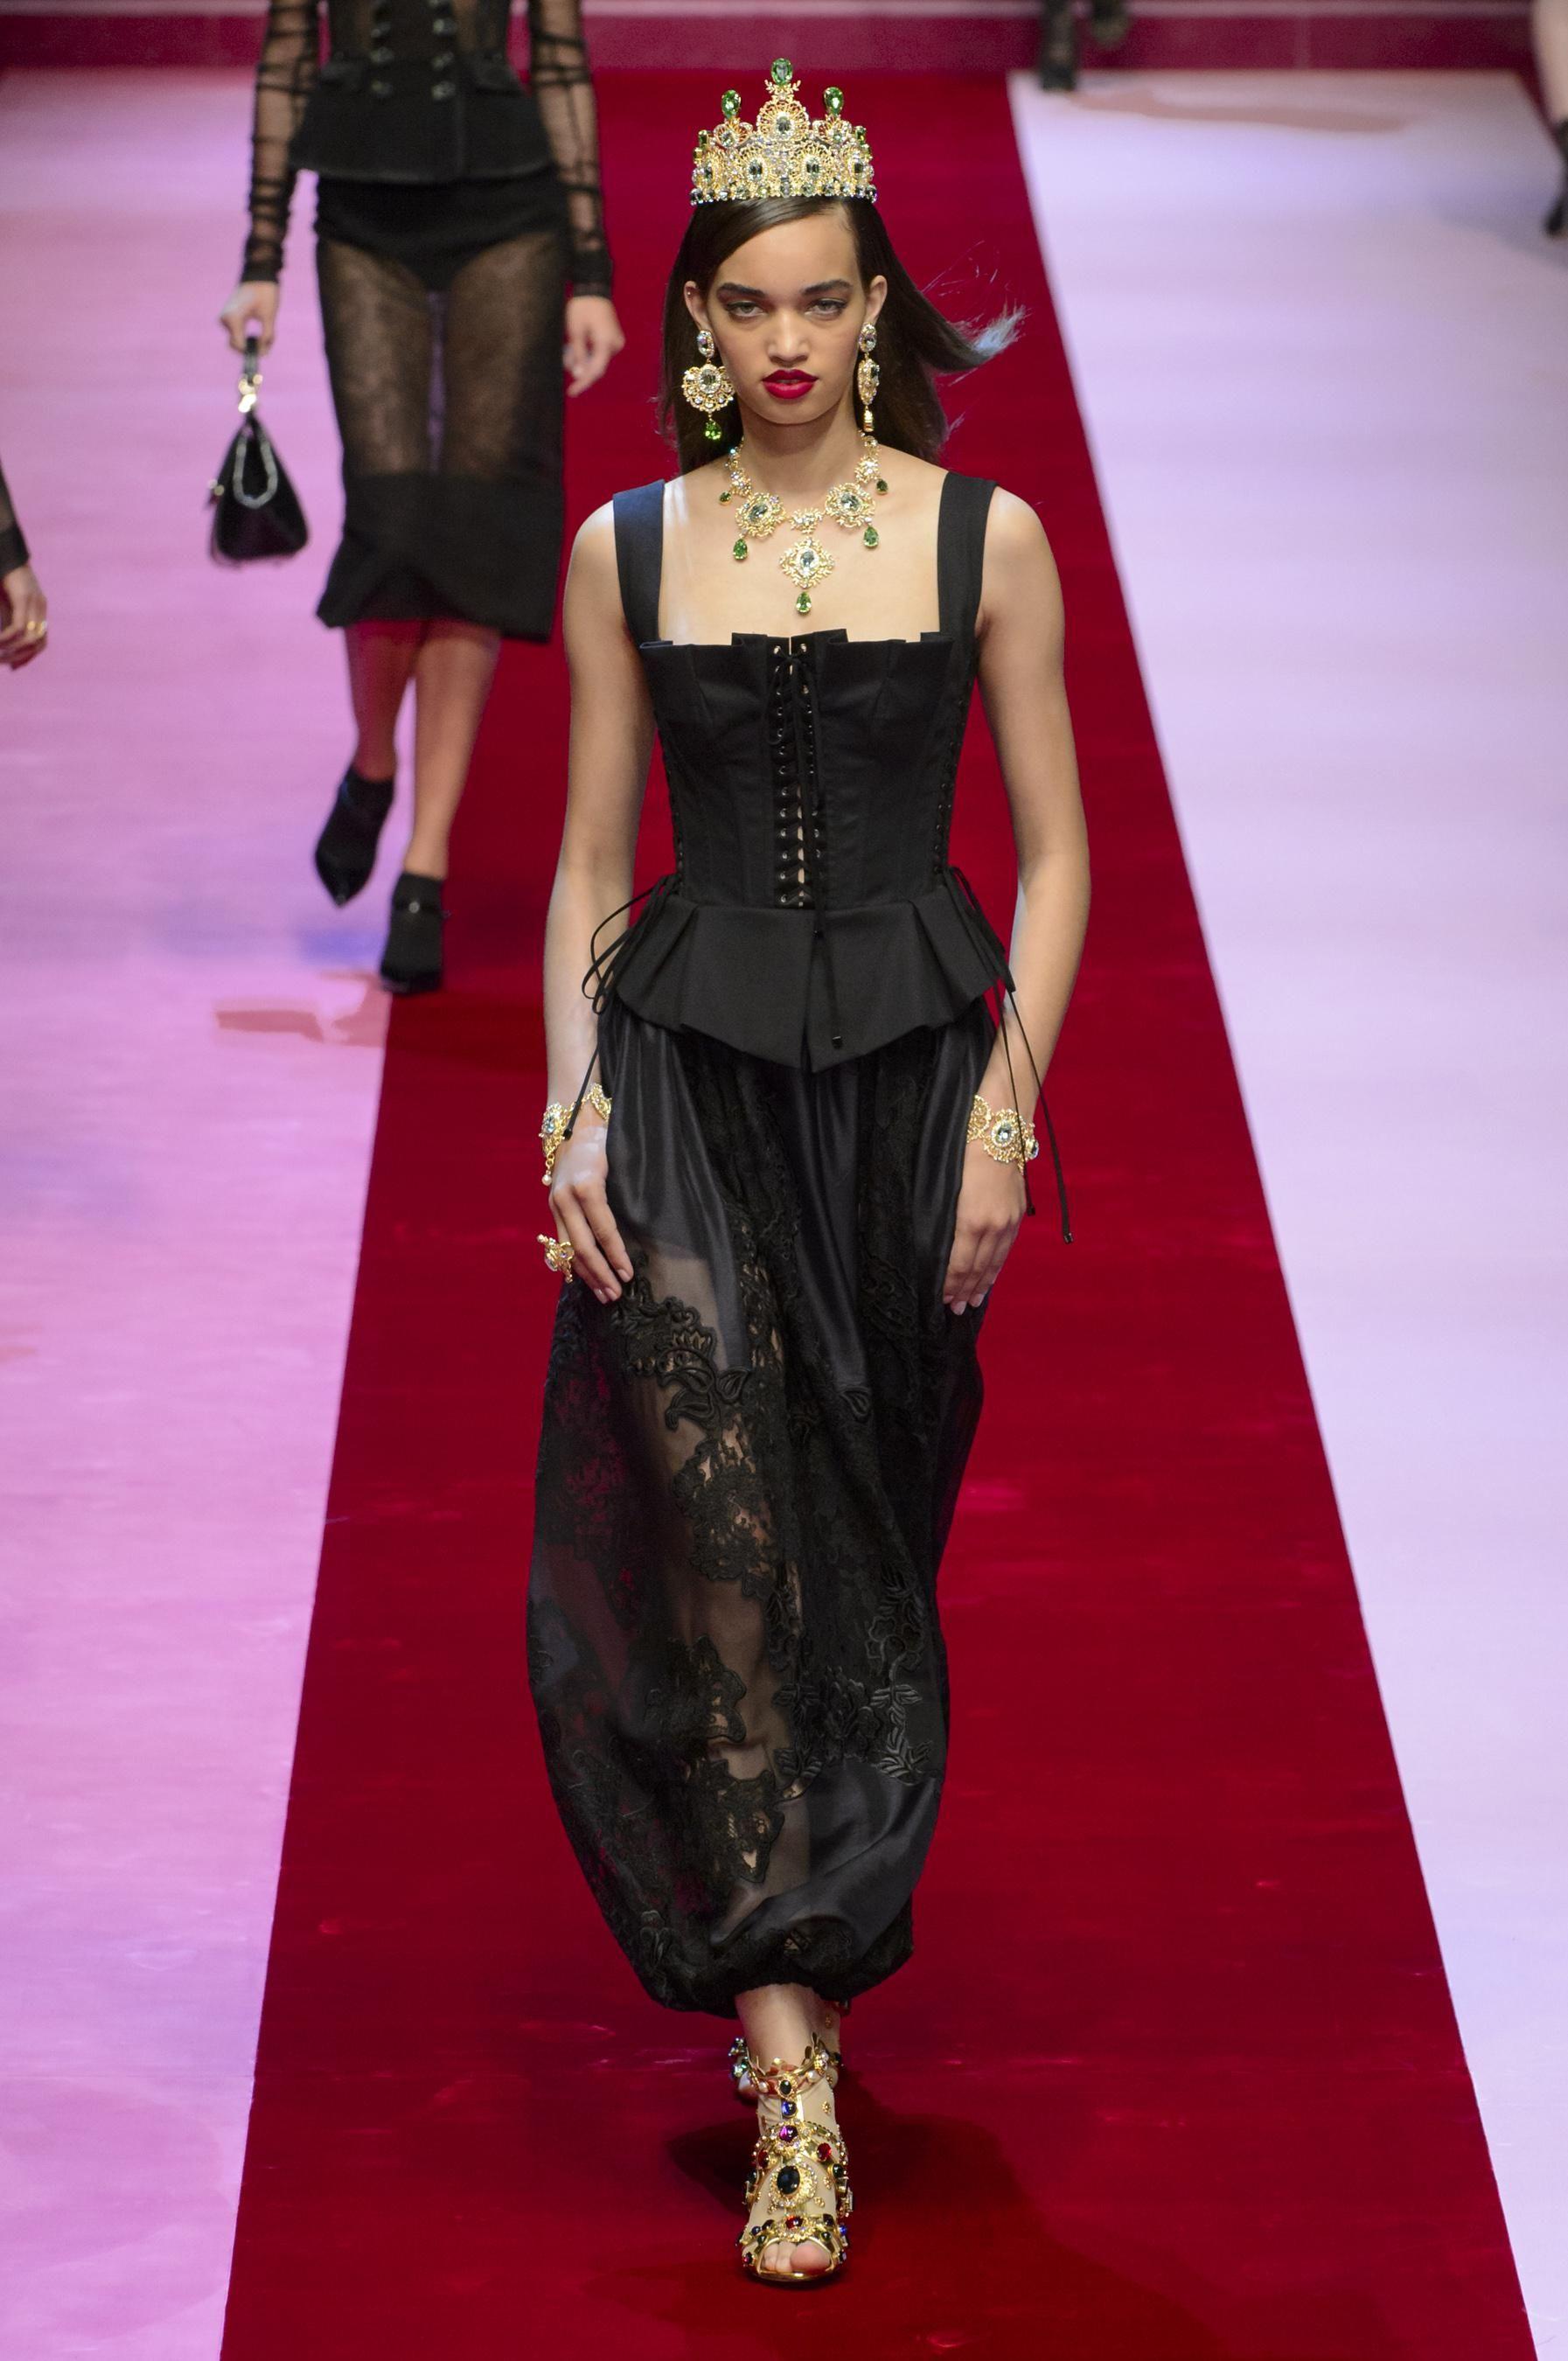 4f9f65189bf4 Défilé Dolce   Gabbana printemps-été 2018 Prêt-à-porter - Madame Figaro